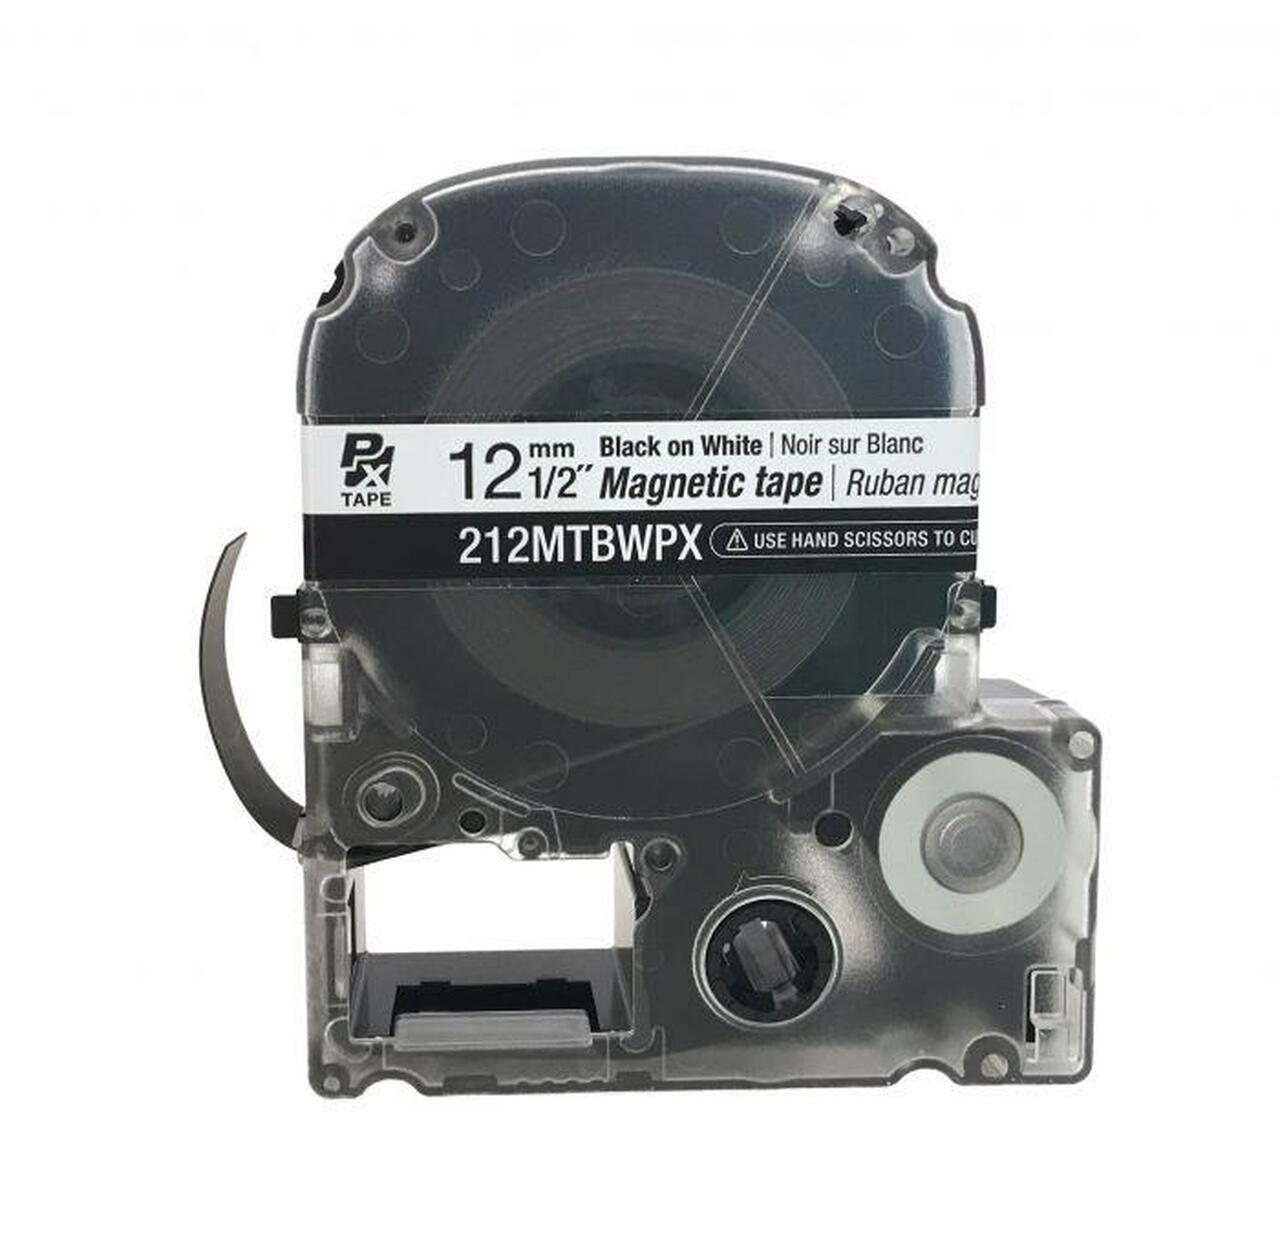 "Epson/K-SUN 212MTBWPX-4.9 BLK ON WHT PX Label Tape 1/2""/12MM Magnet Tape"